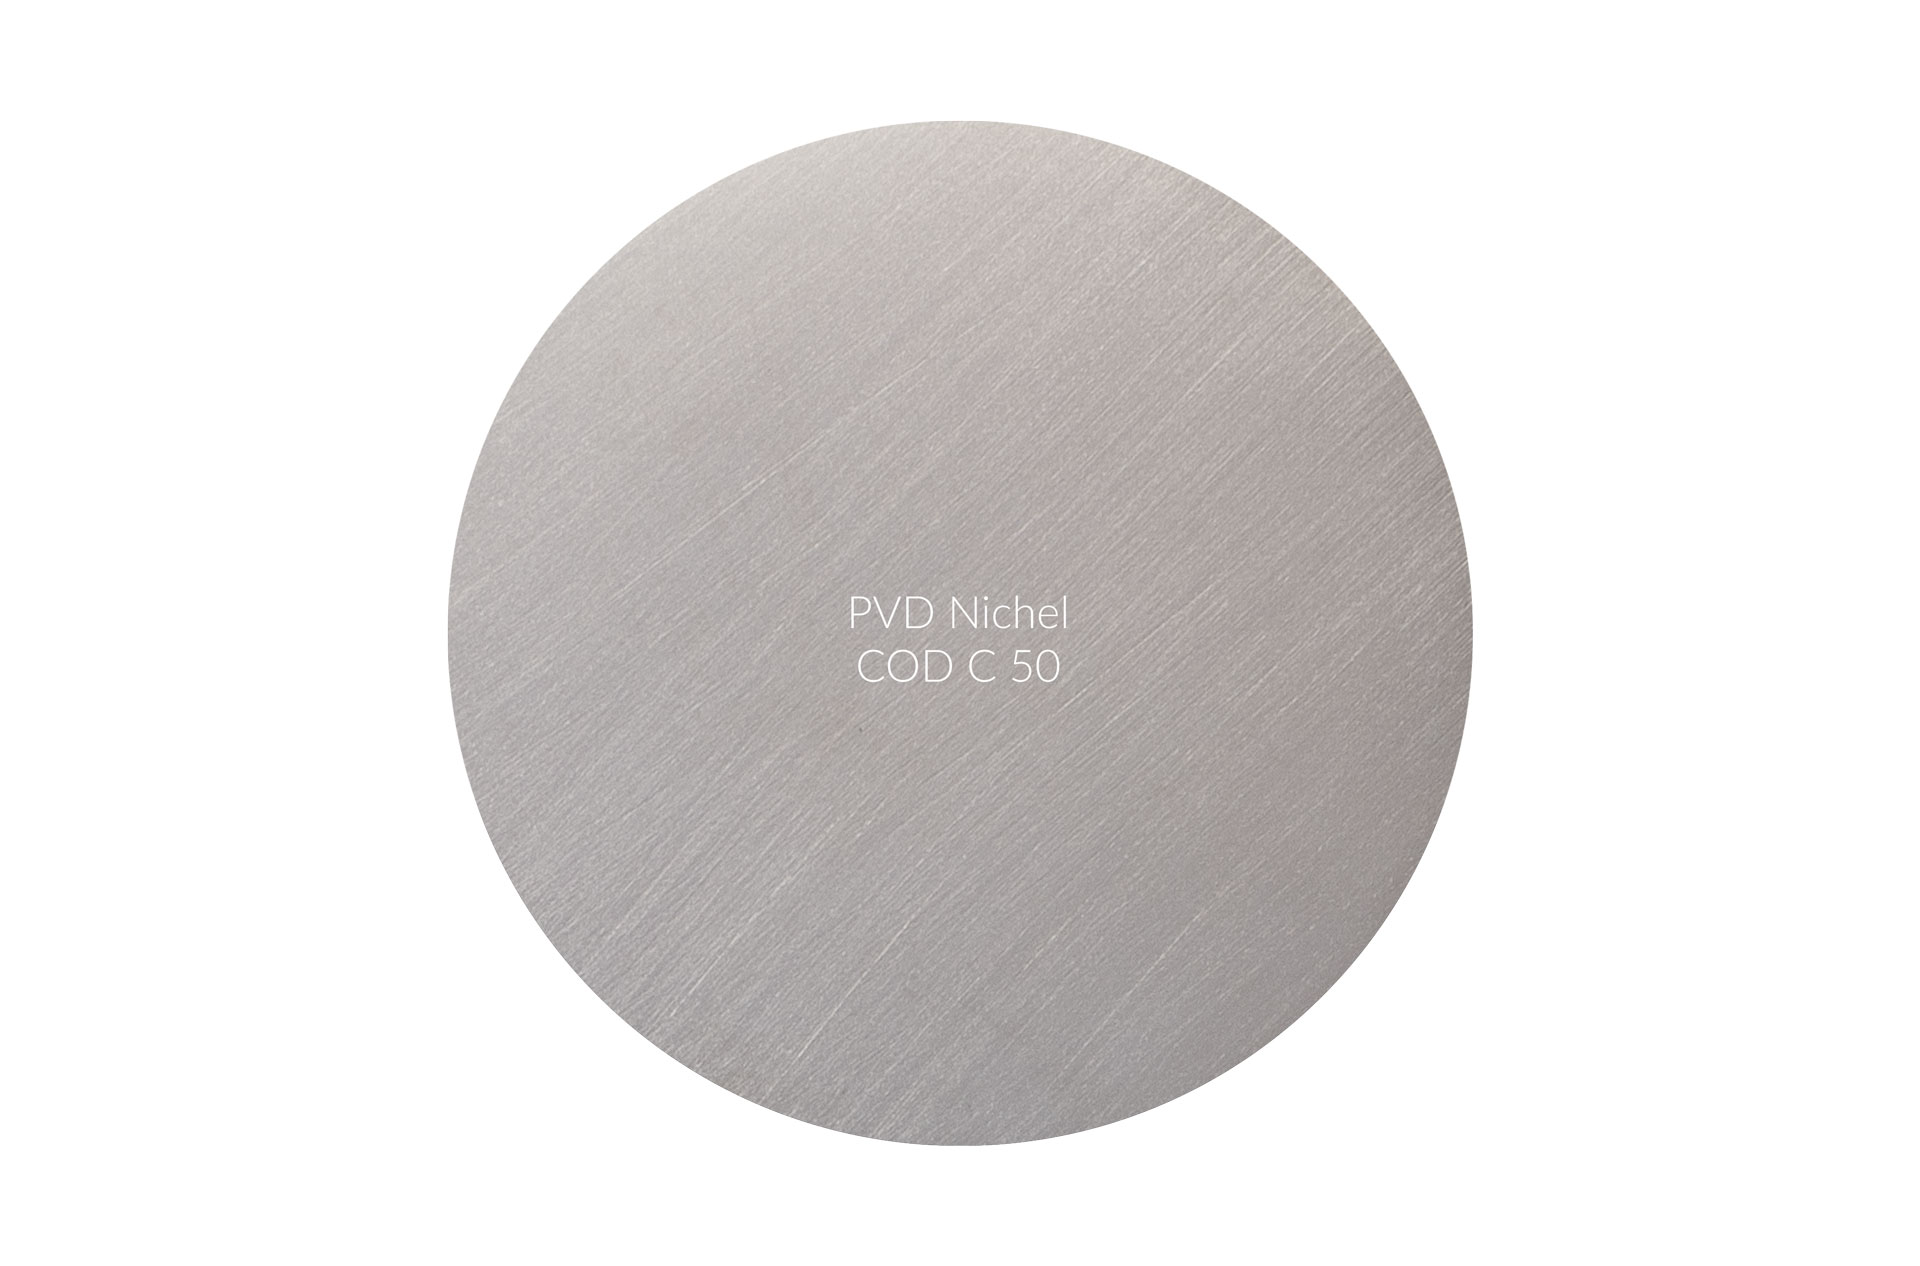 Dischetto PVD nichel cod C 50 graffiato